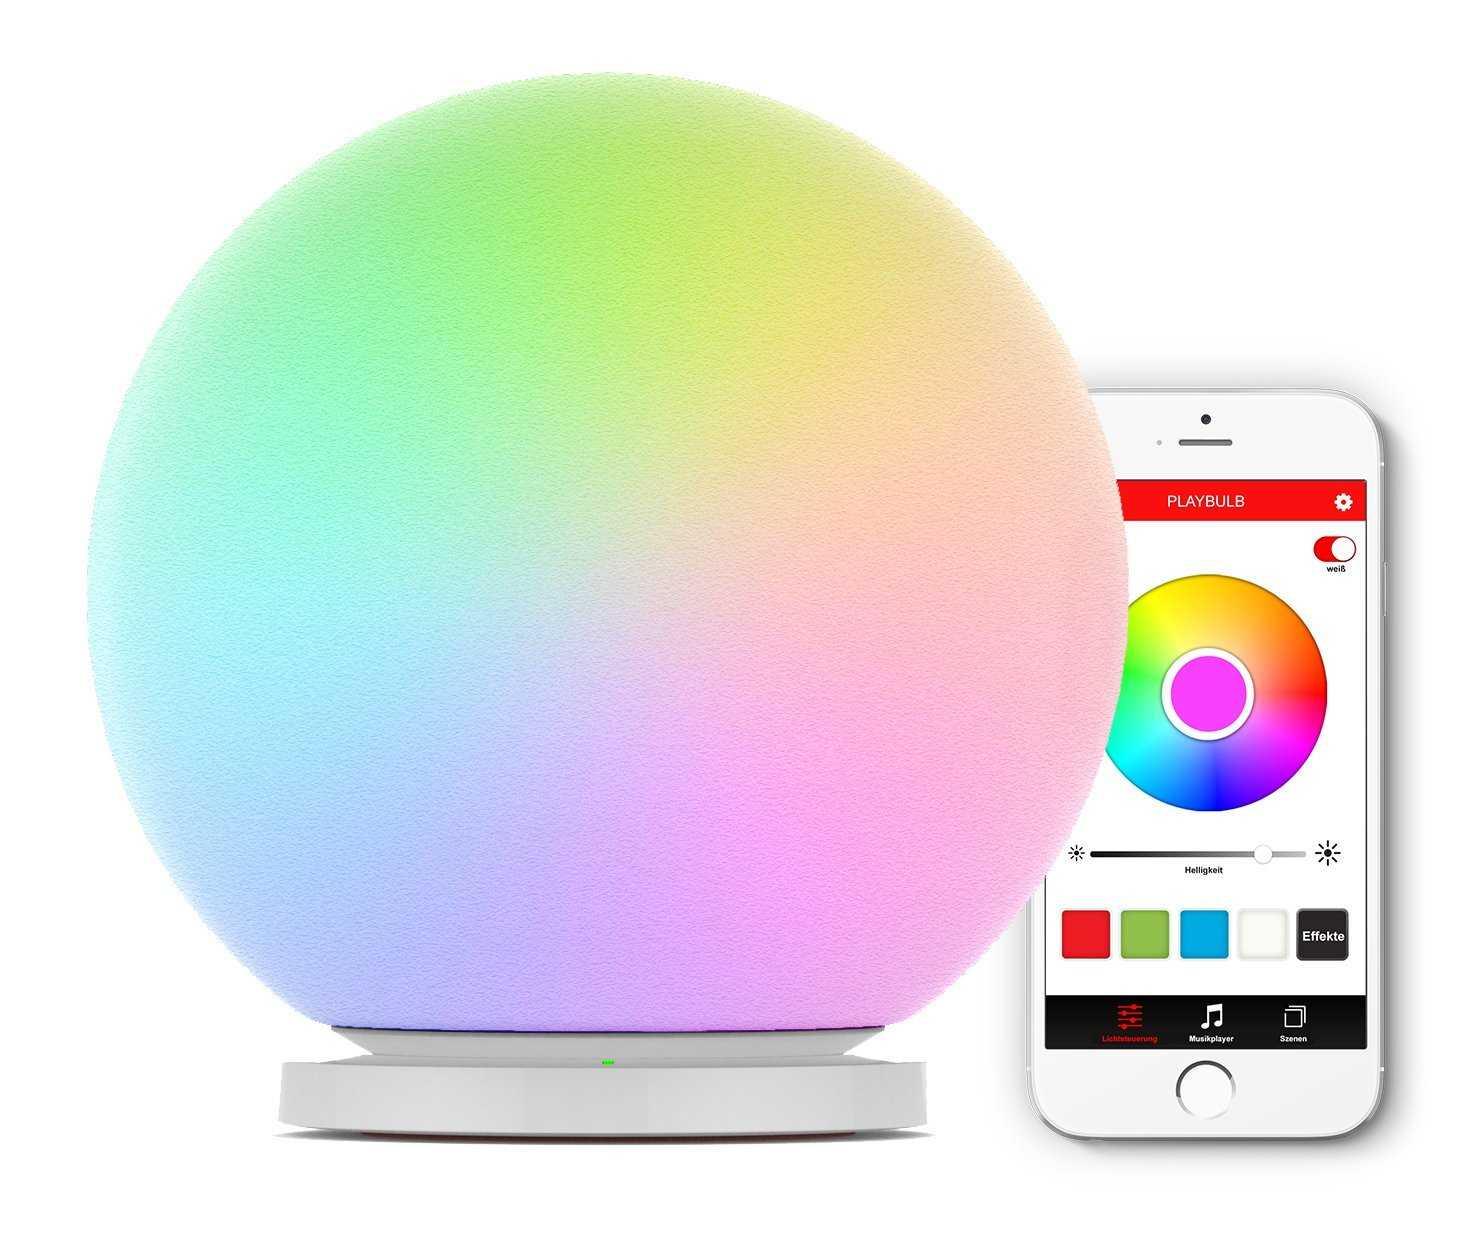 amazon playbulb sphere app gesteuerte rgb led leuchtkugel lampe stimmungslicht farbwechsel. Black Bedroom Furniture Sets. Home Design Ideas